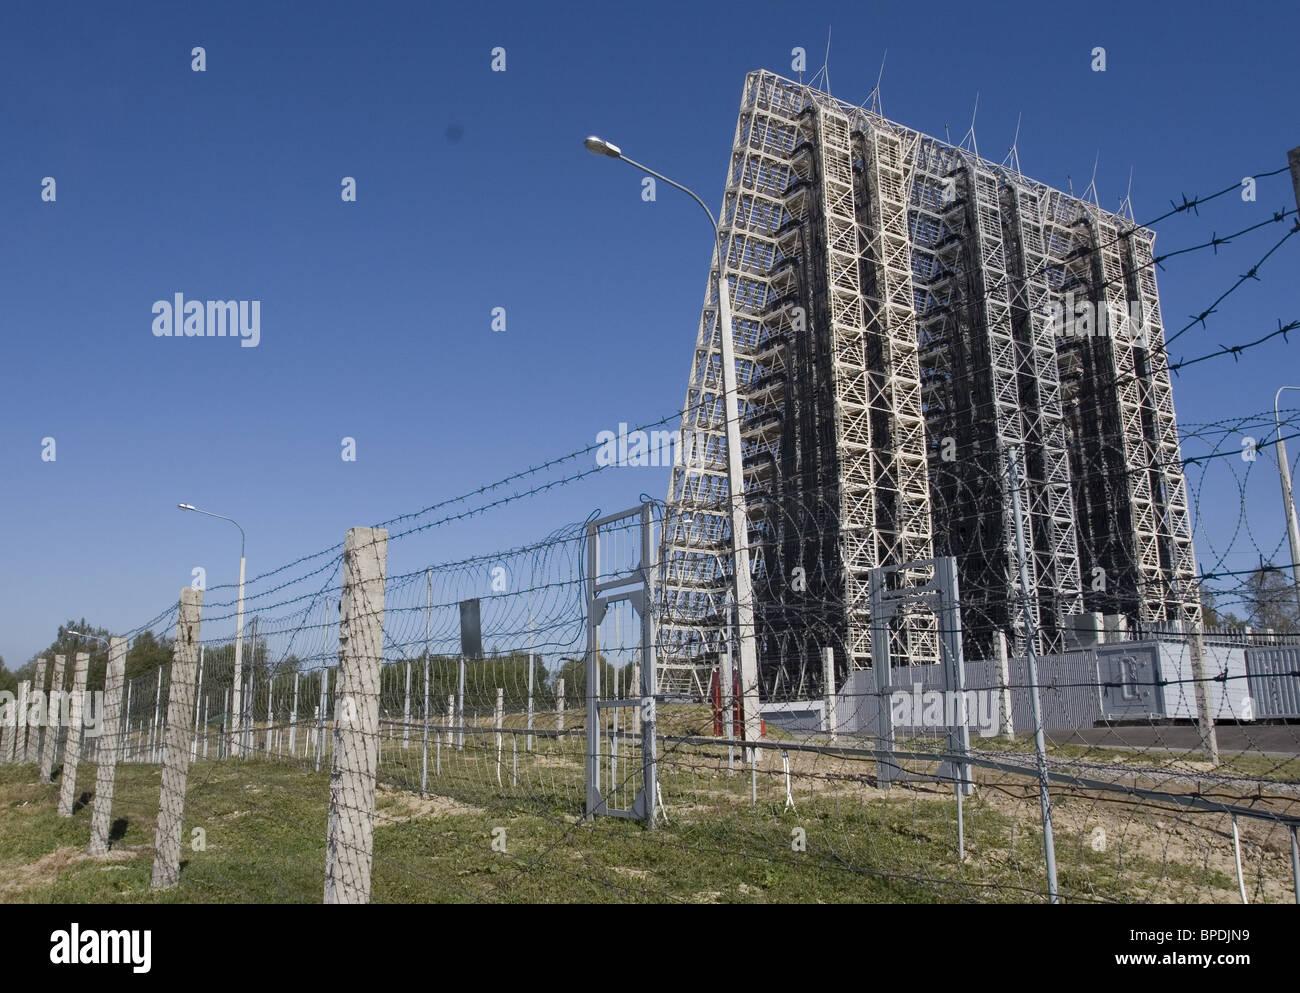 next-generation-voronezh-radar-station-near-st-petersburg-BPDJN9.jpg